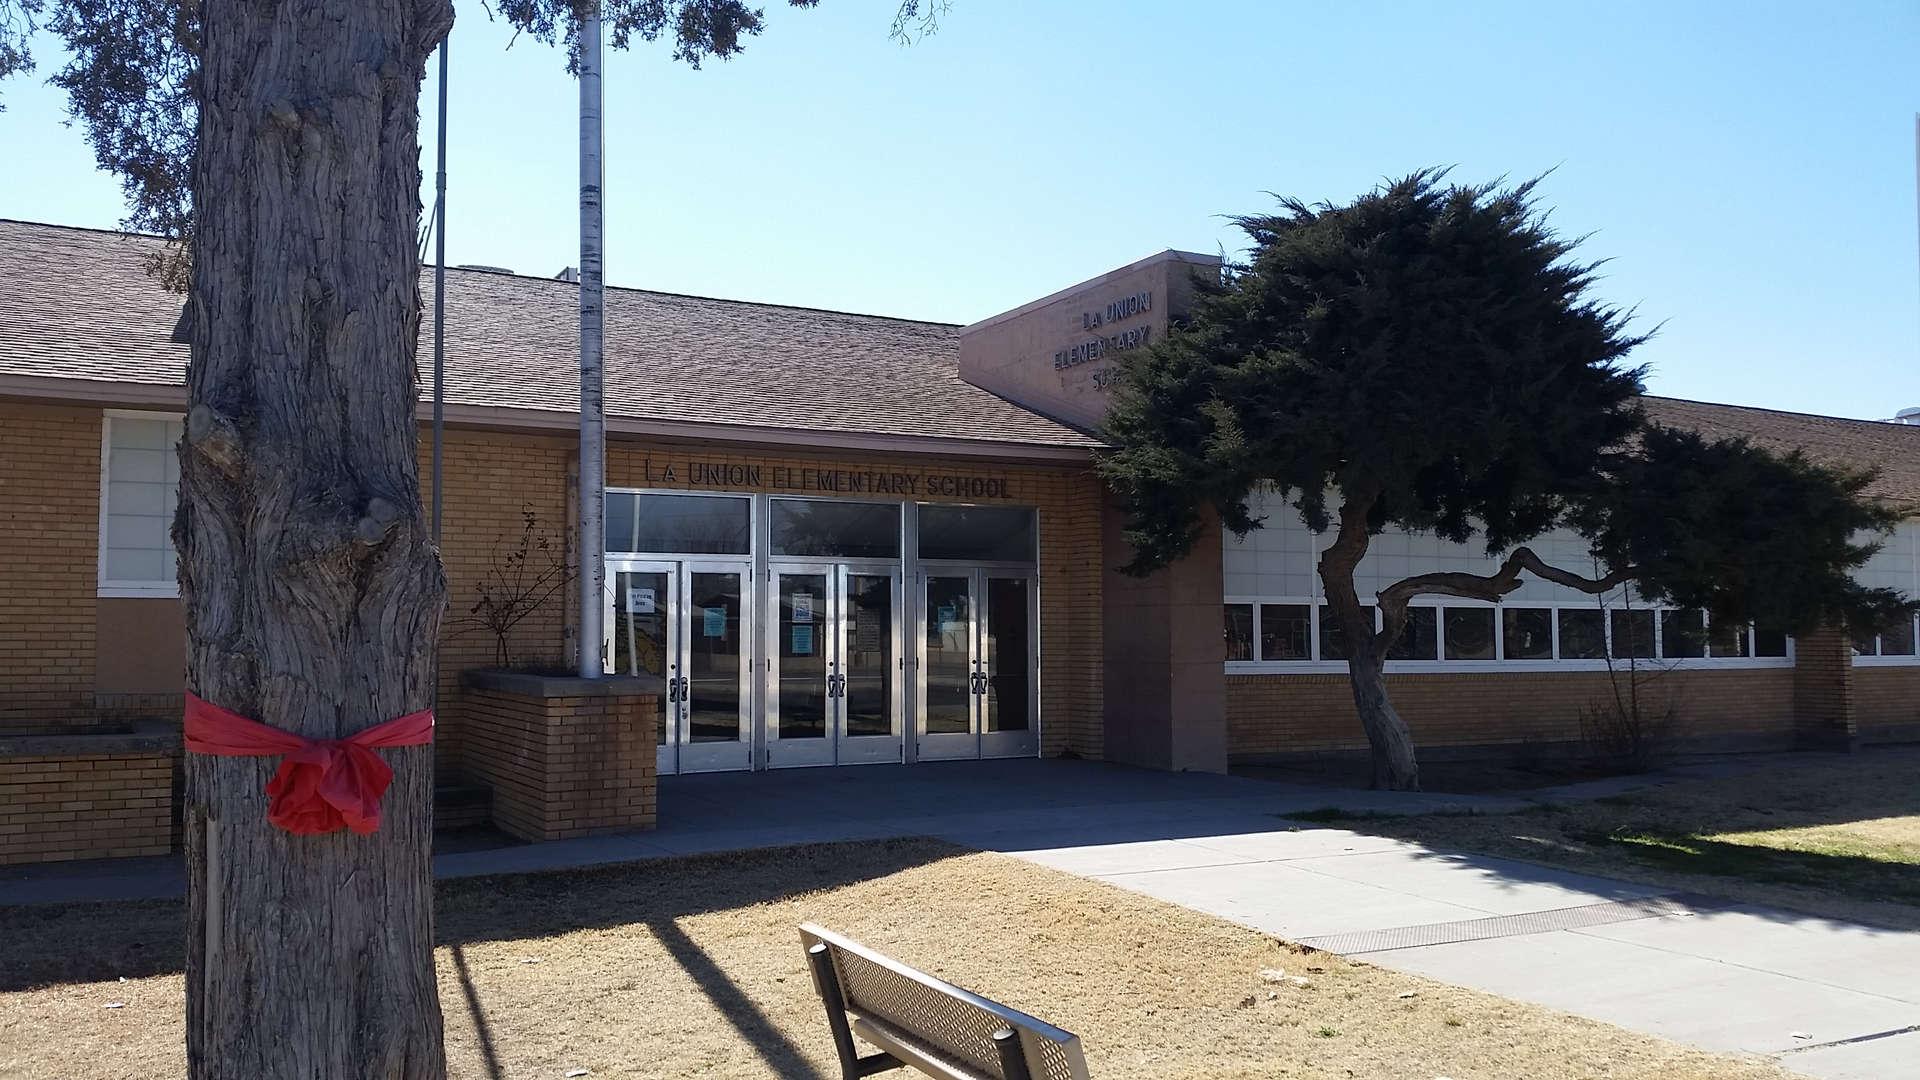 La Union Elementary front fascade